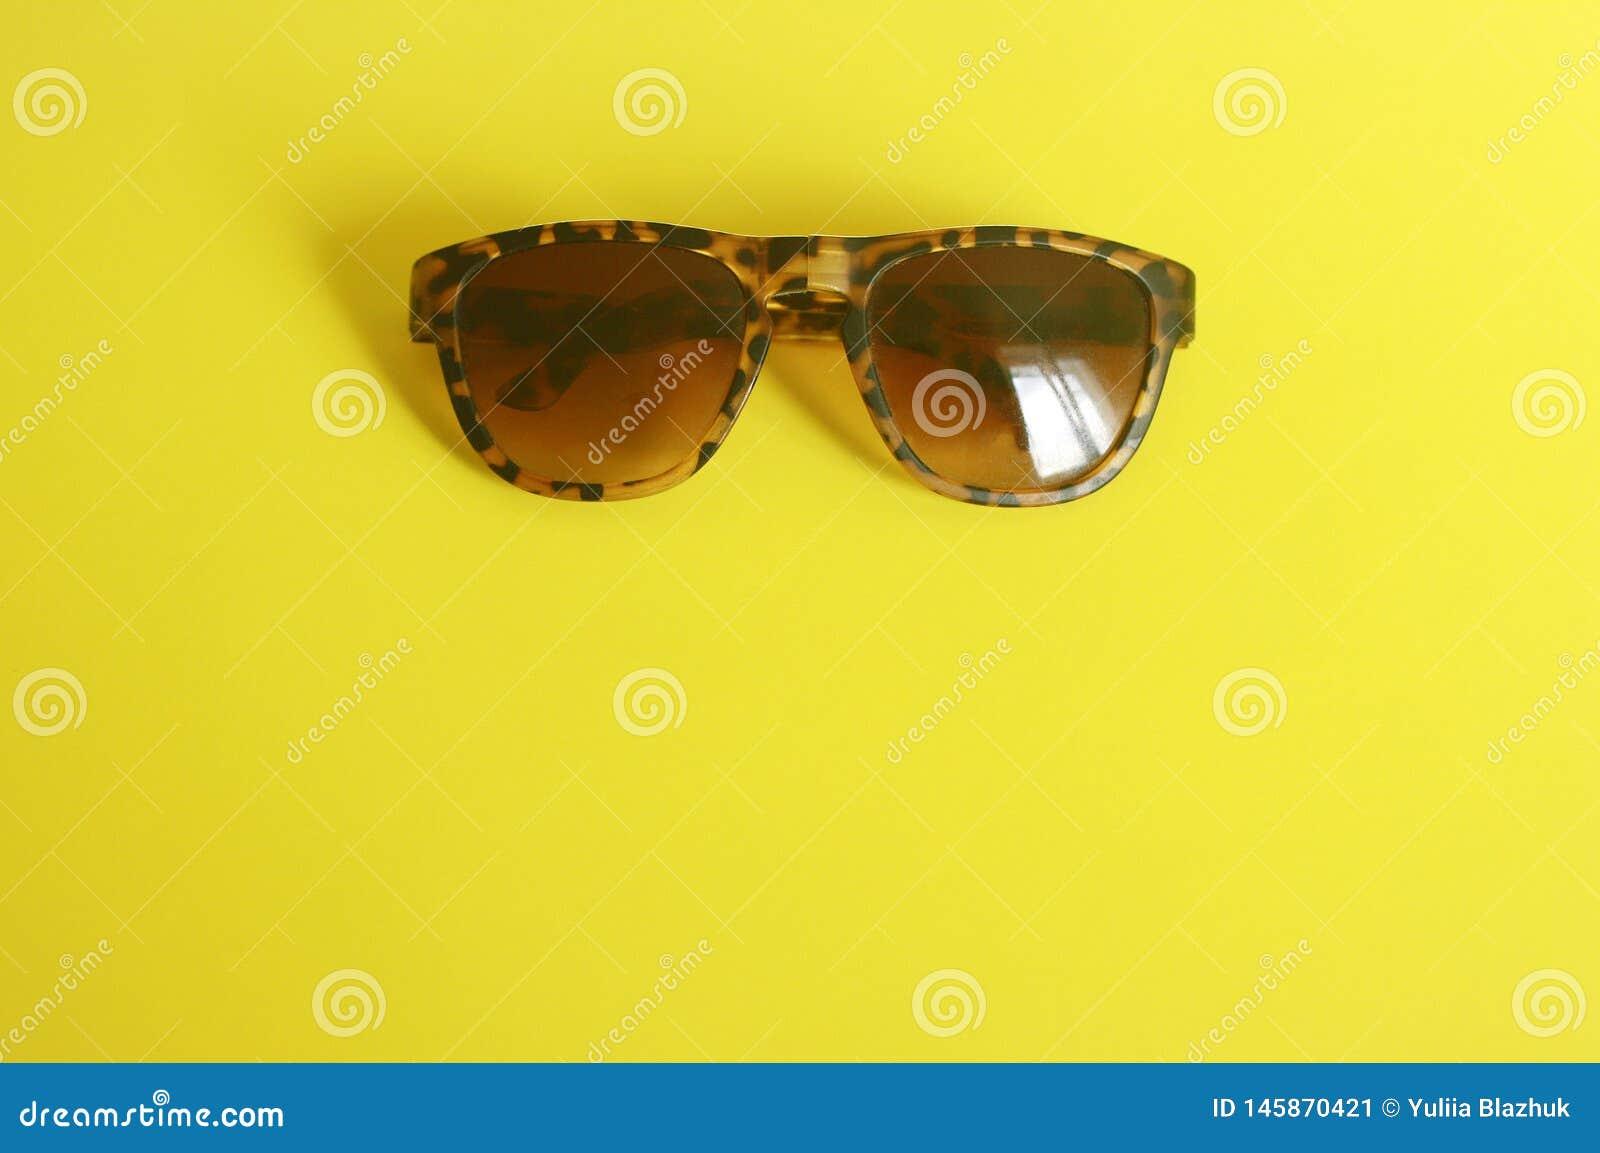 Fashionable animal print sunglasses on yellow background